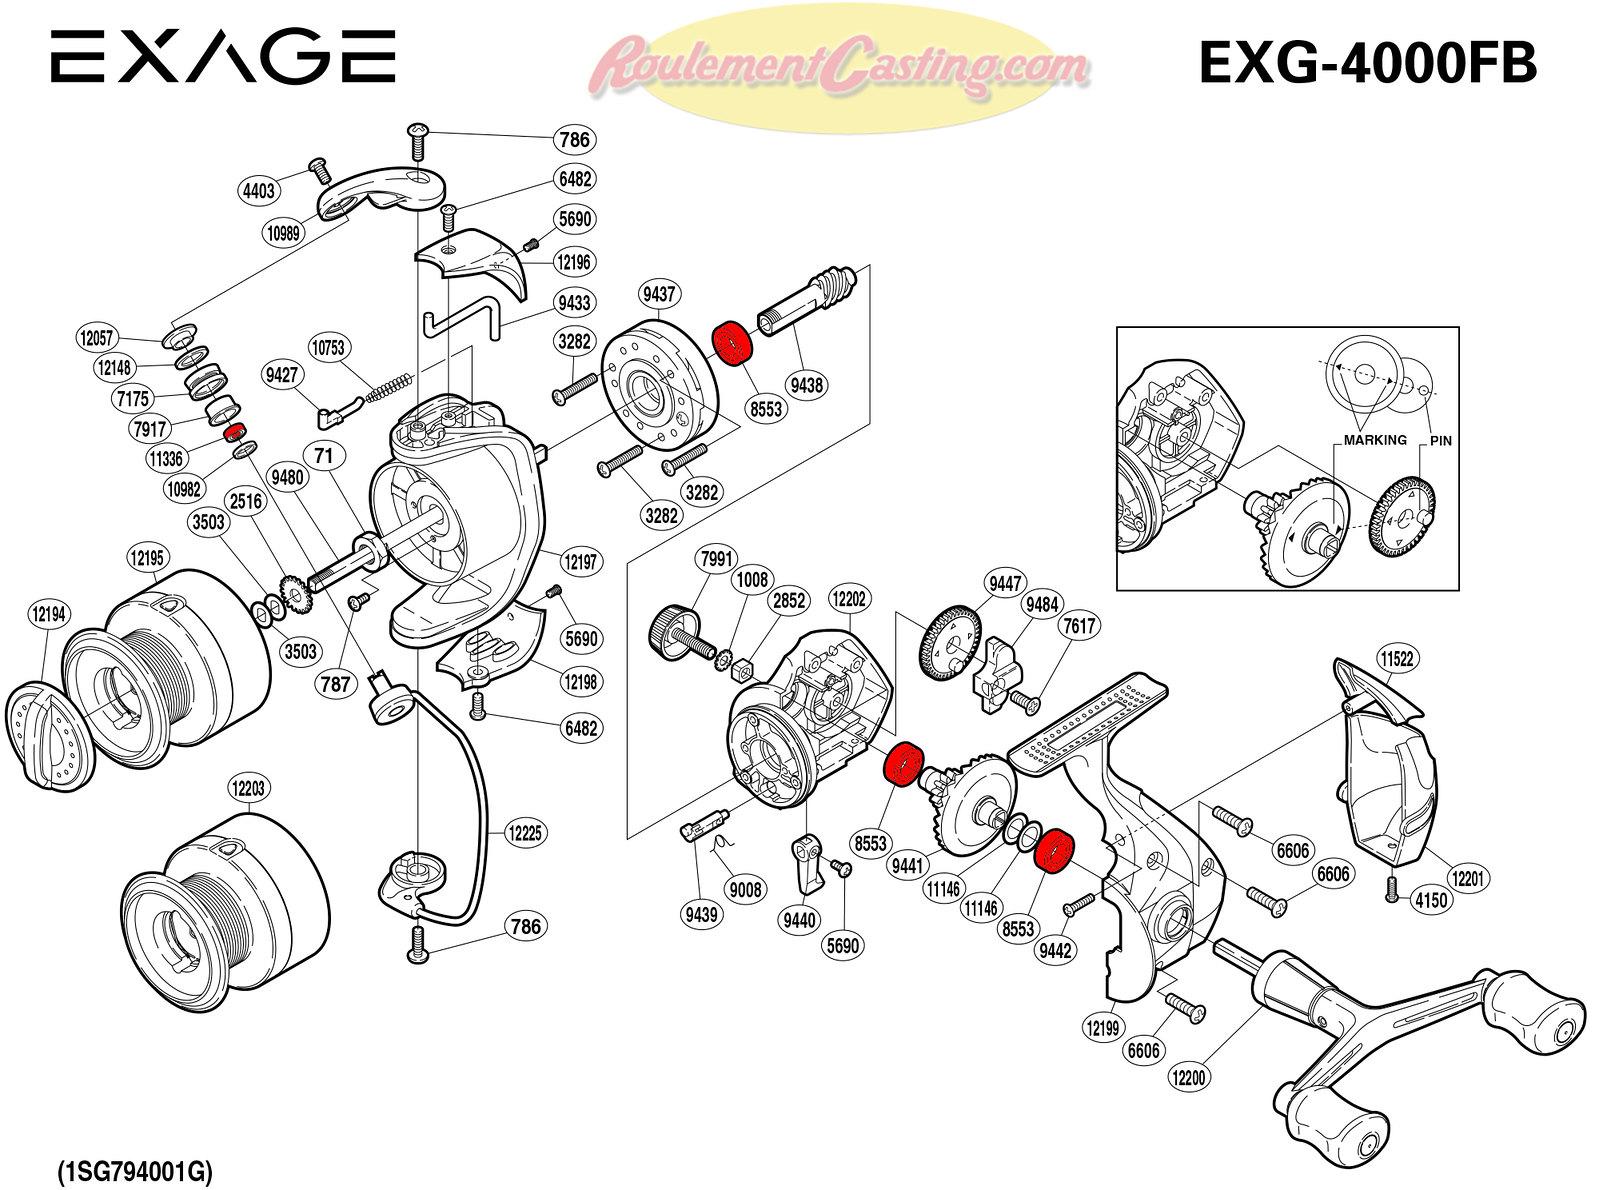 Schema-Shimano-EXAGE-4000FB